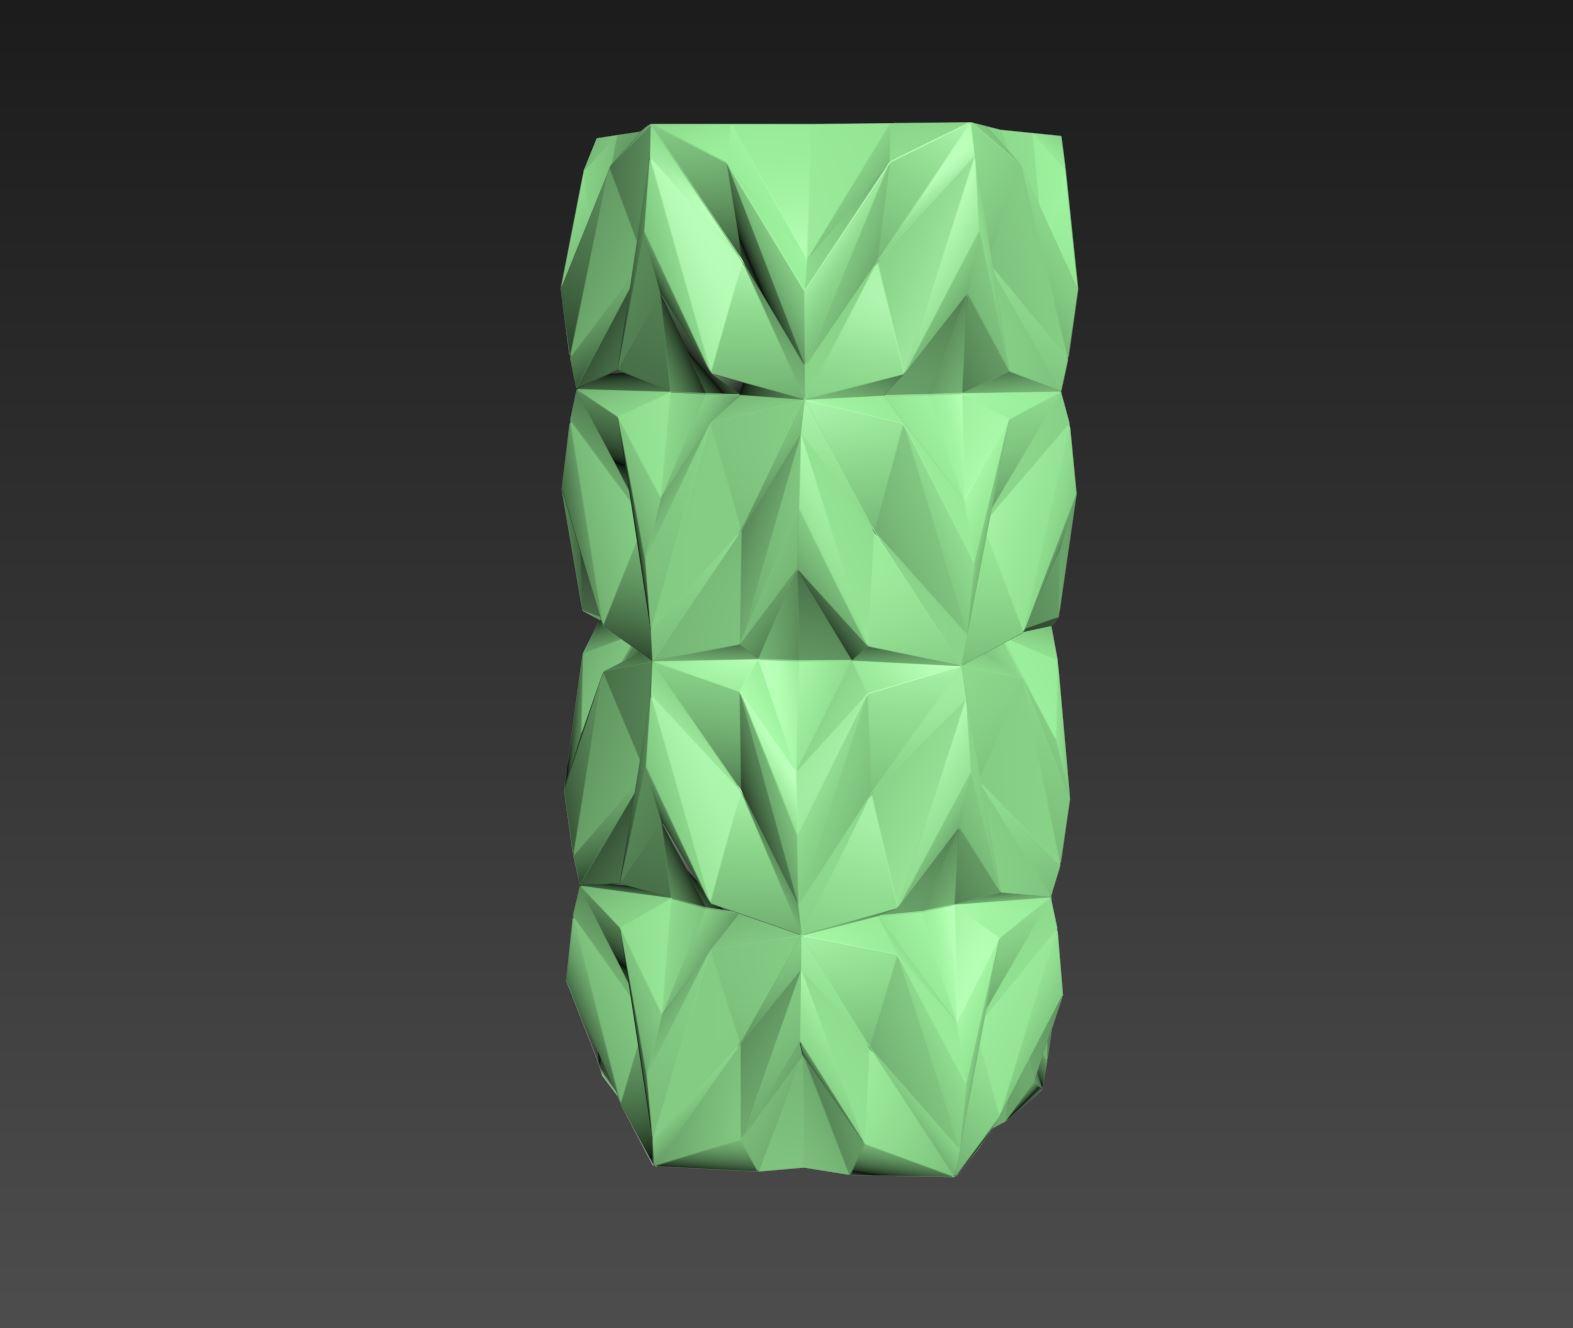 10.jpg Download free STL file Geometric Vase • 3D printable object, tridimagina